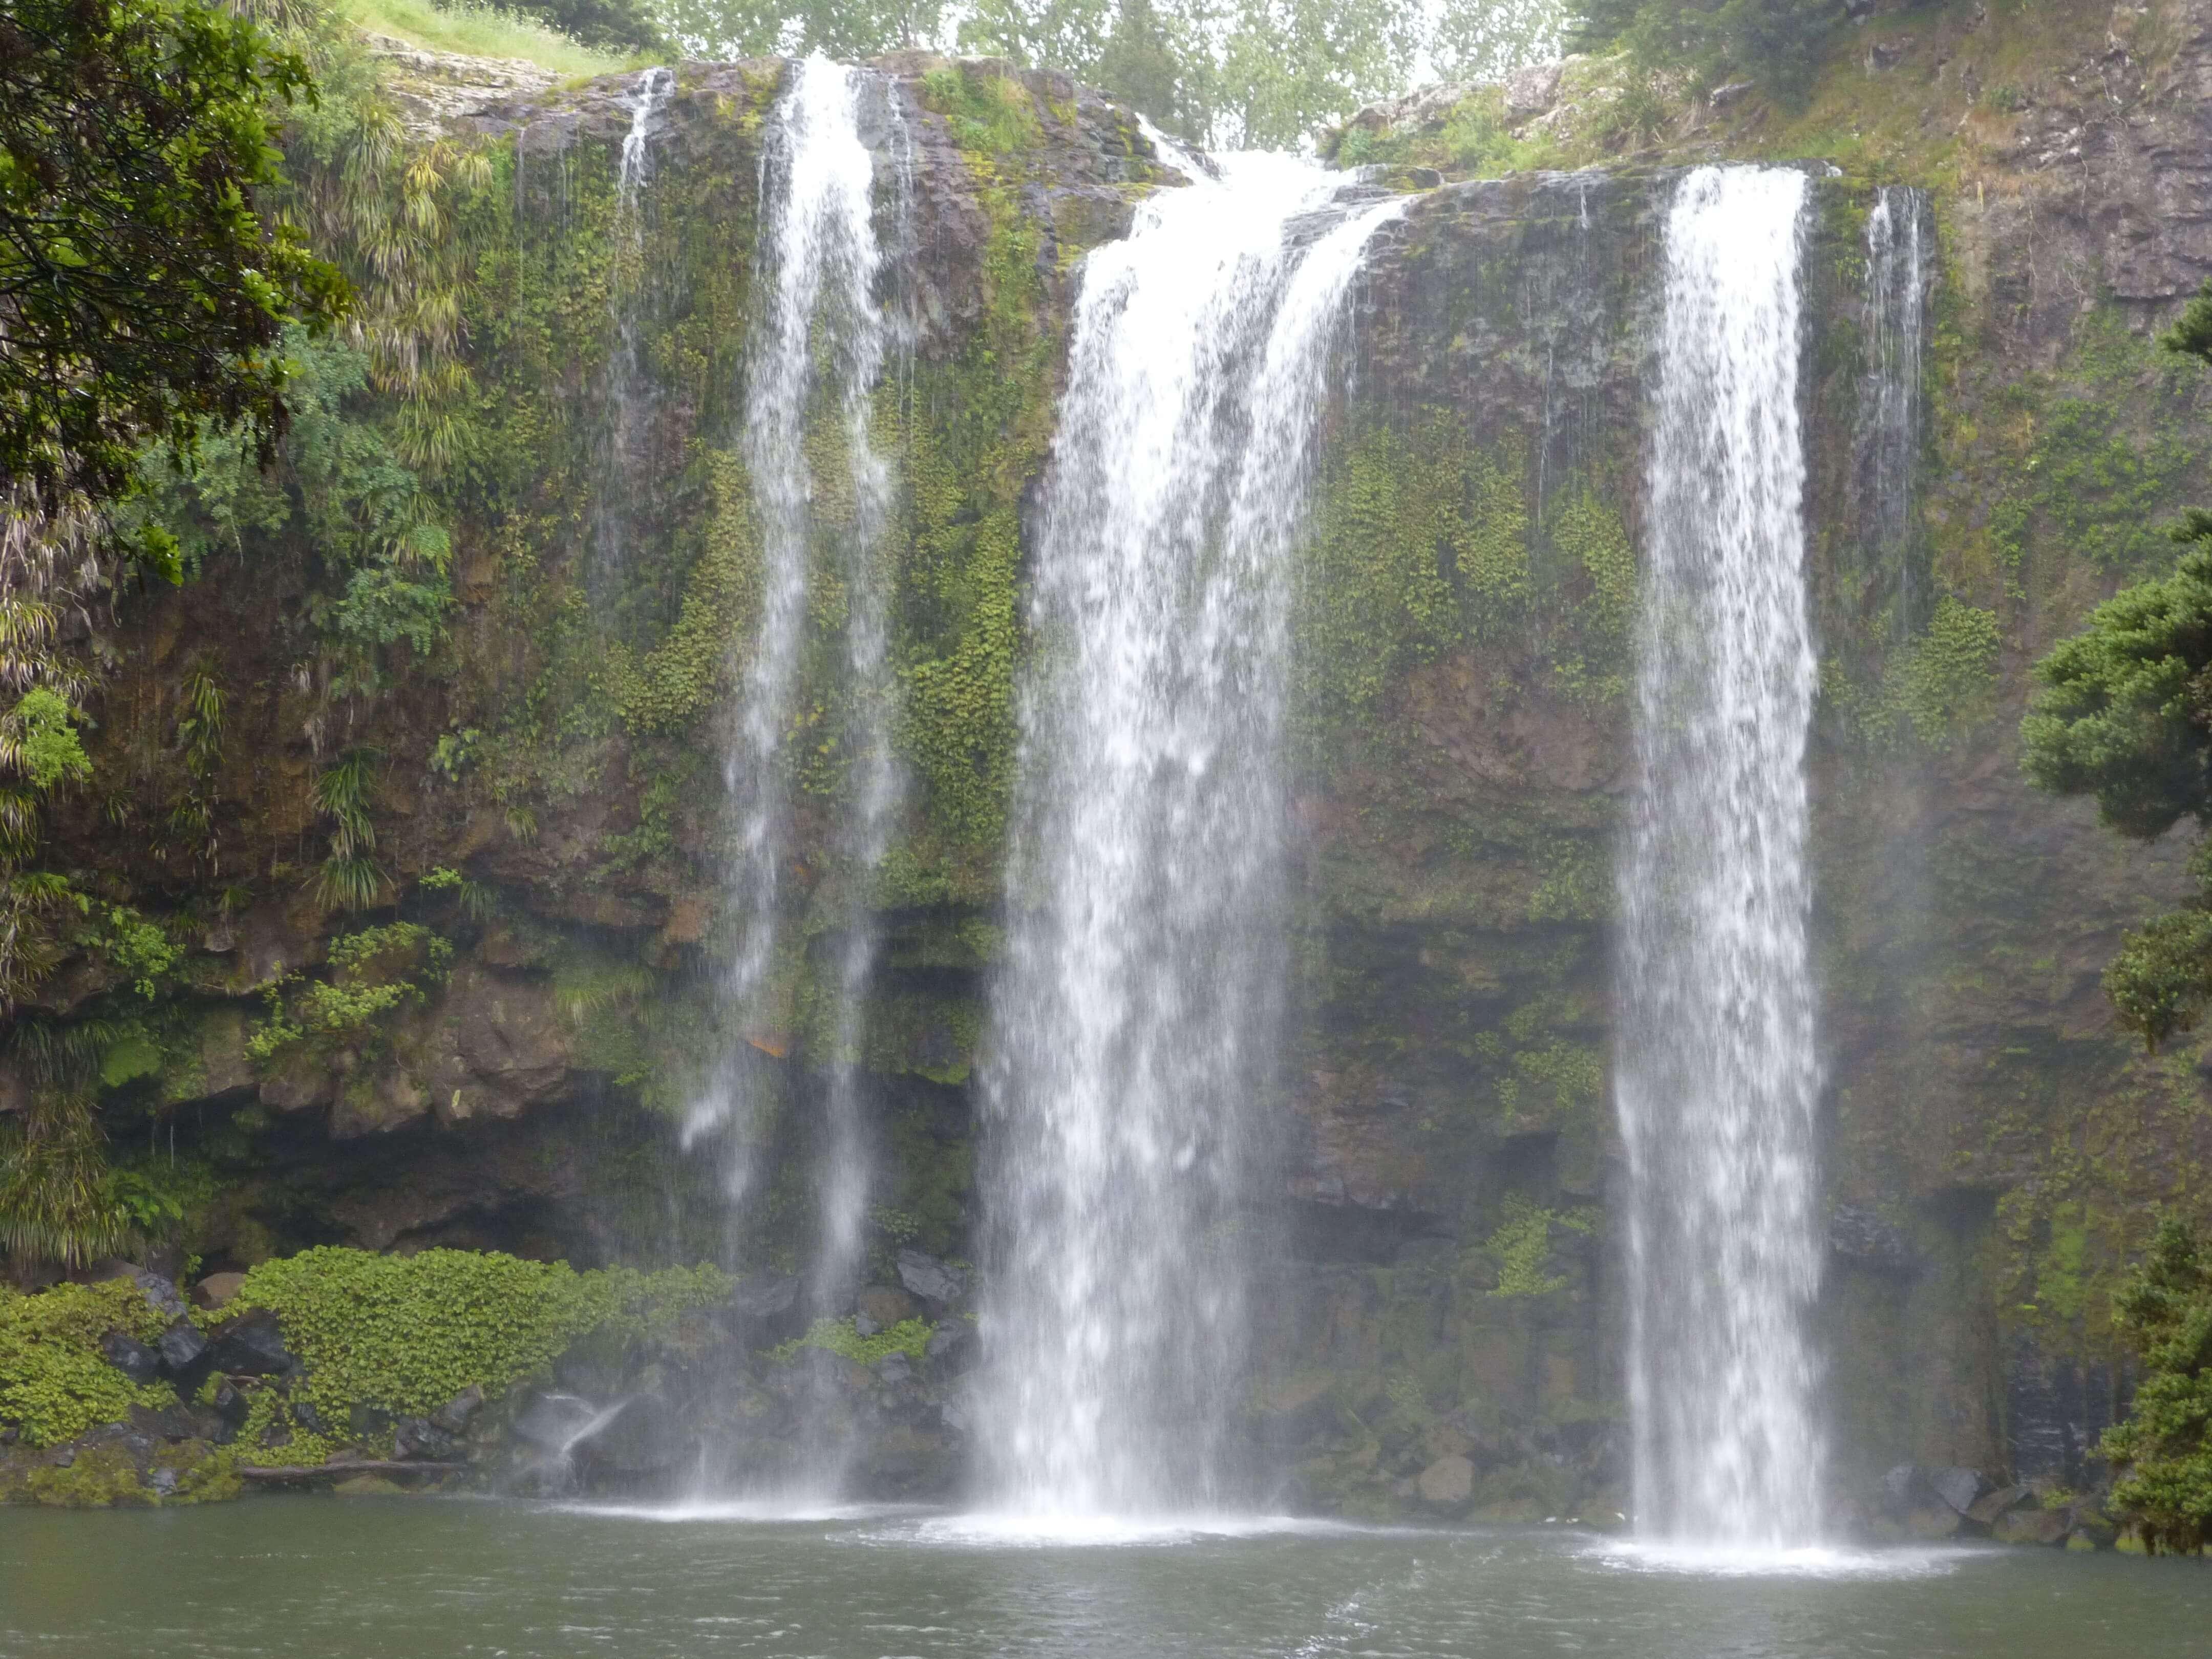 Weit weg Reisen, Whangarei Falls, Neuseeland 7